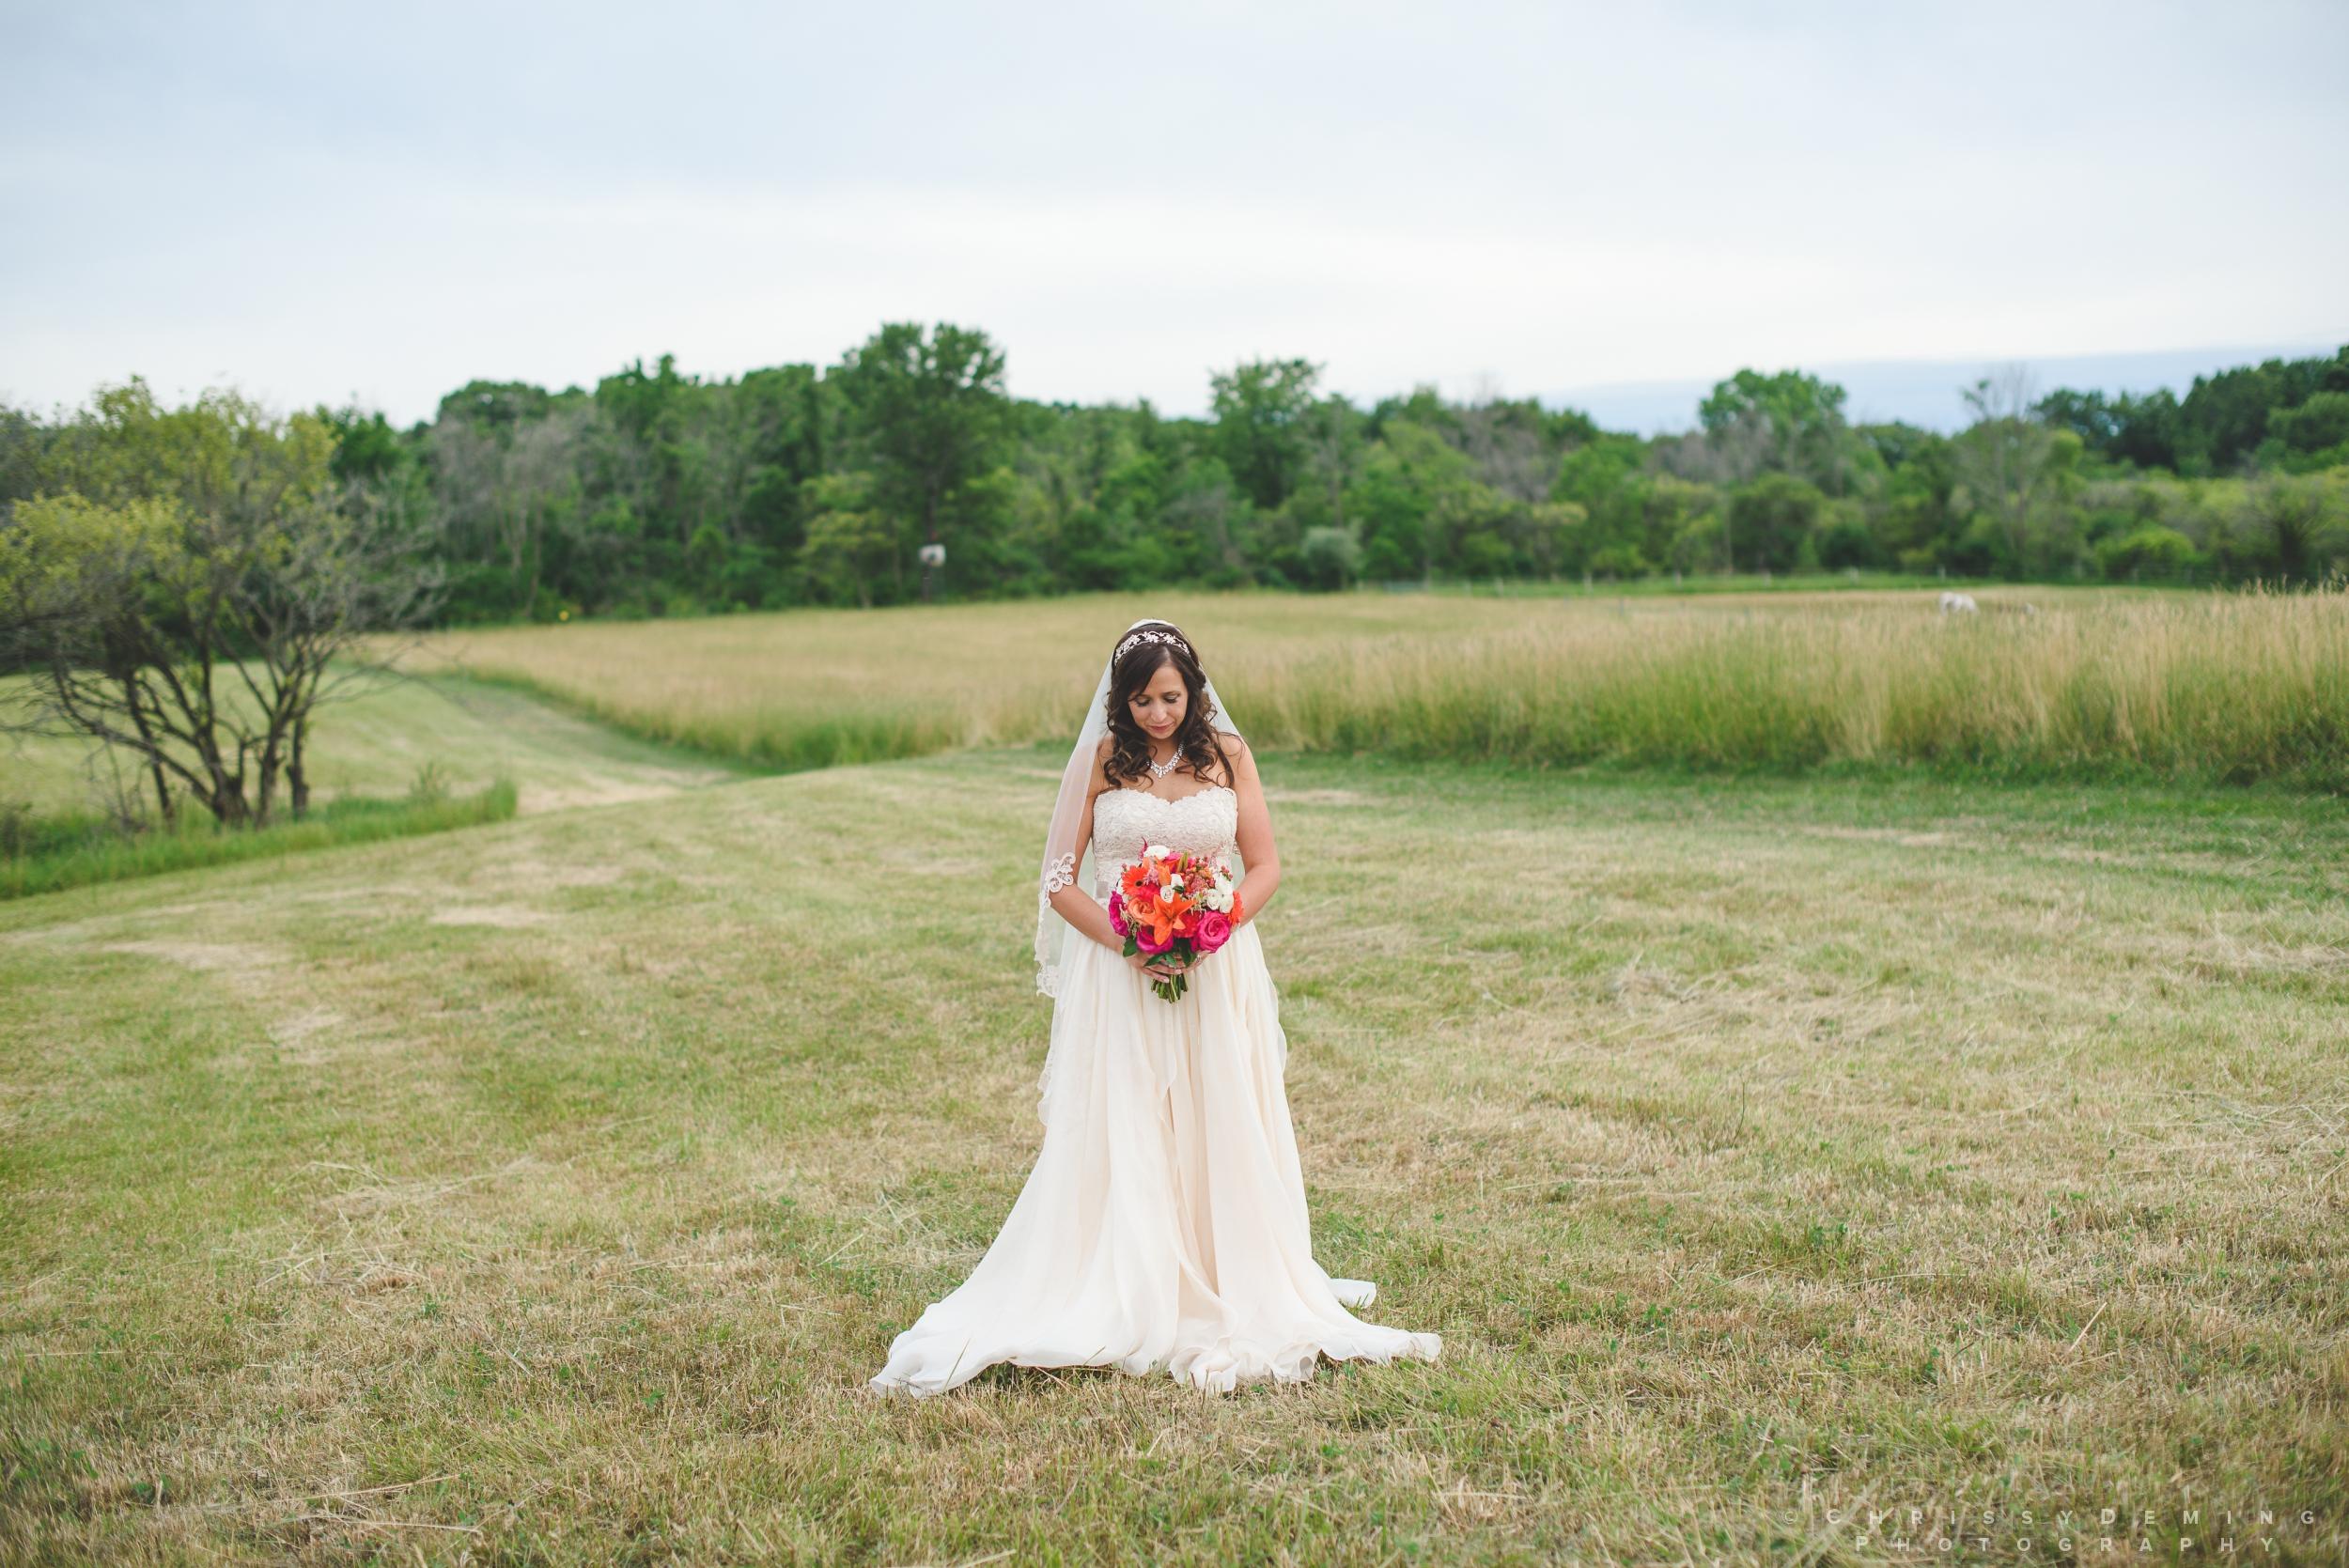 crete_IL_farm_wedding_photographer_0051.jpg